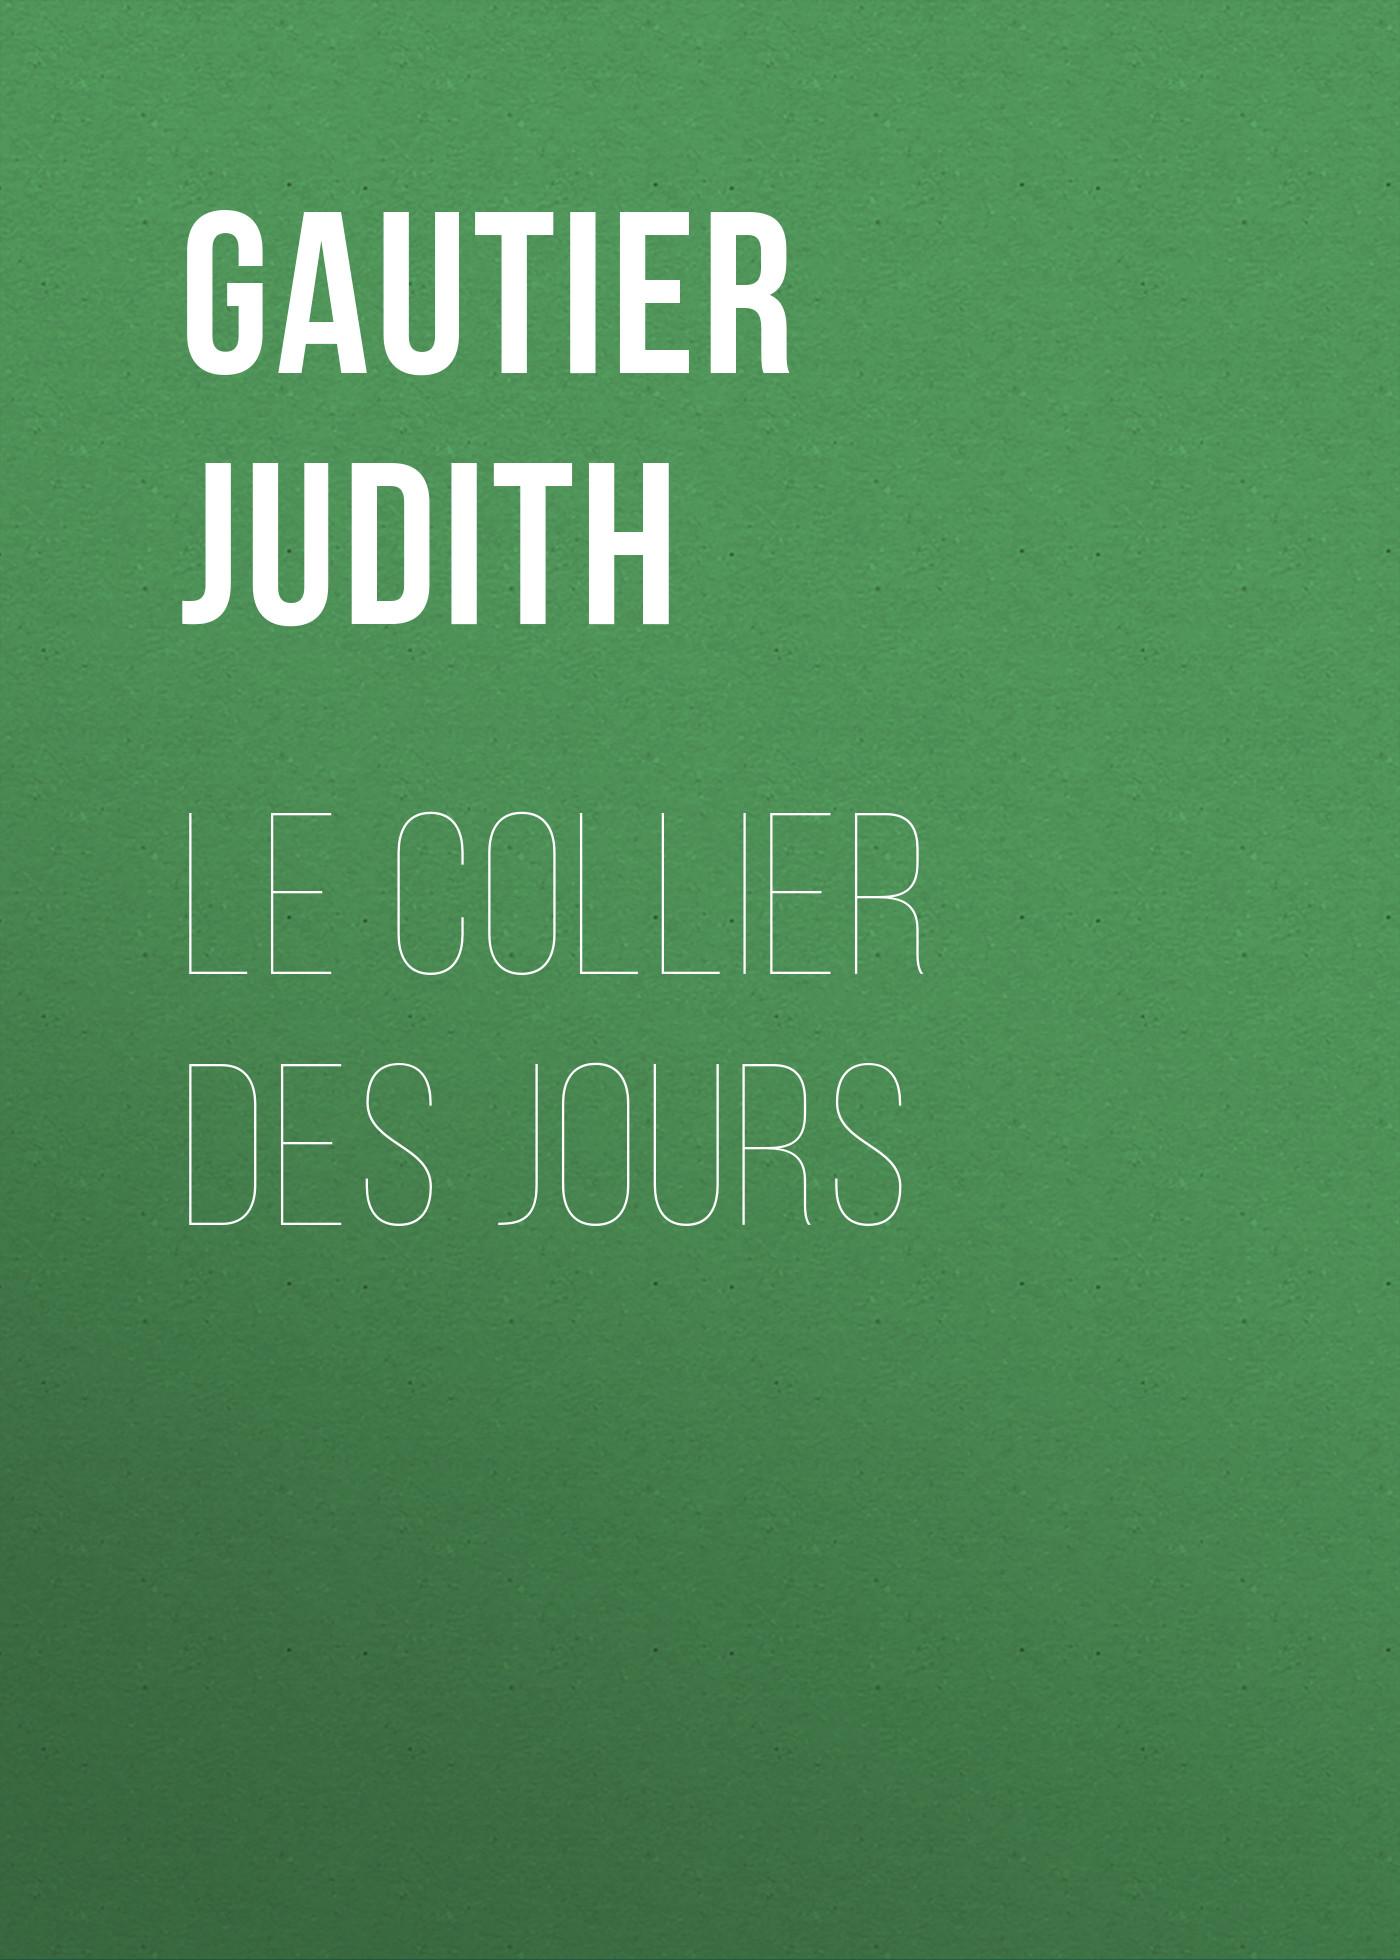 Gautier Judith Le collier des jours musicalarue 2018 pass 3 jours